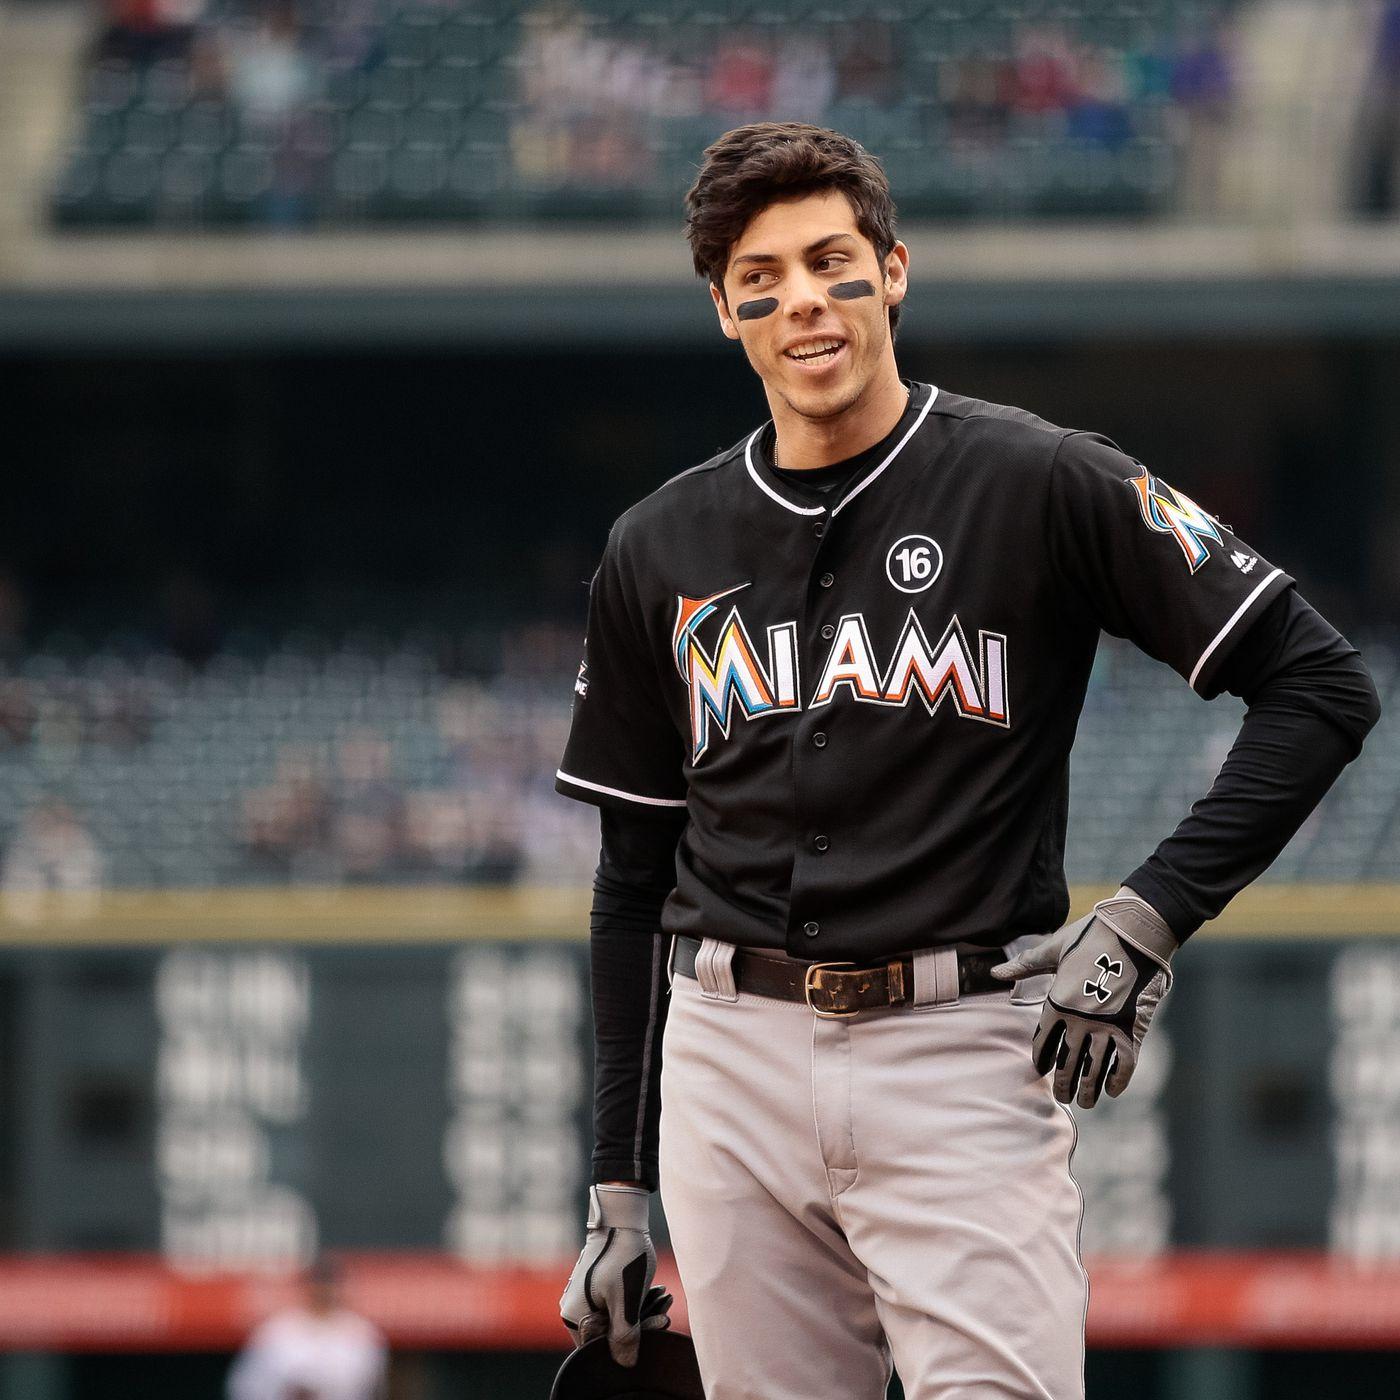 Christian Yelich Miami Marlins Baseball Player Jersey